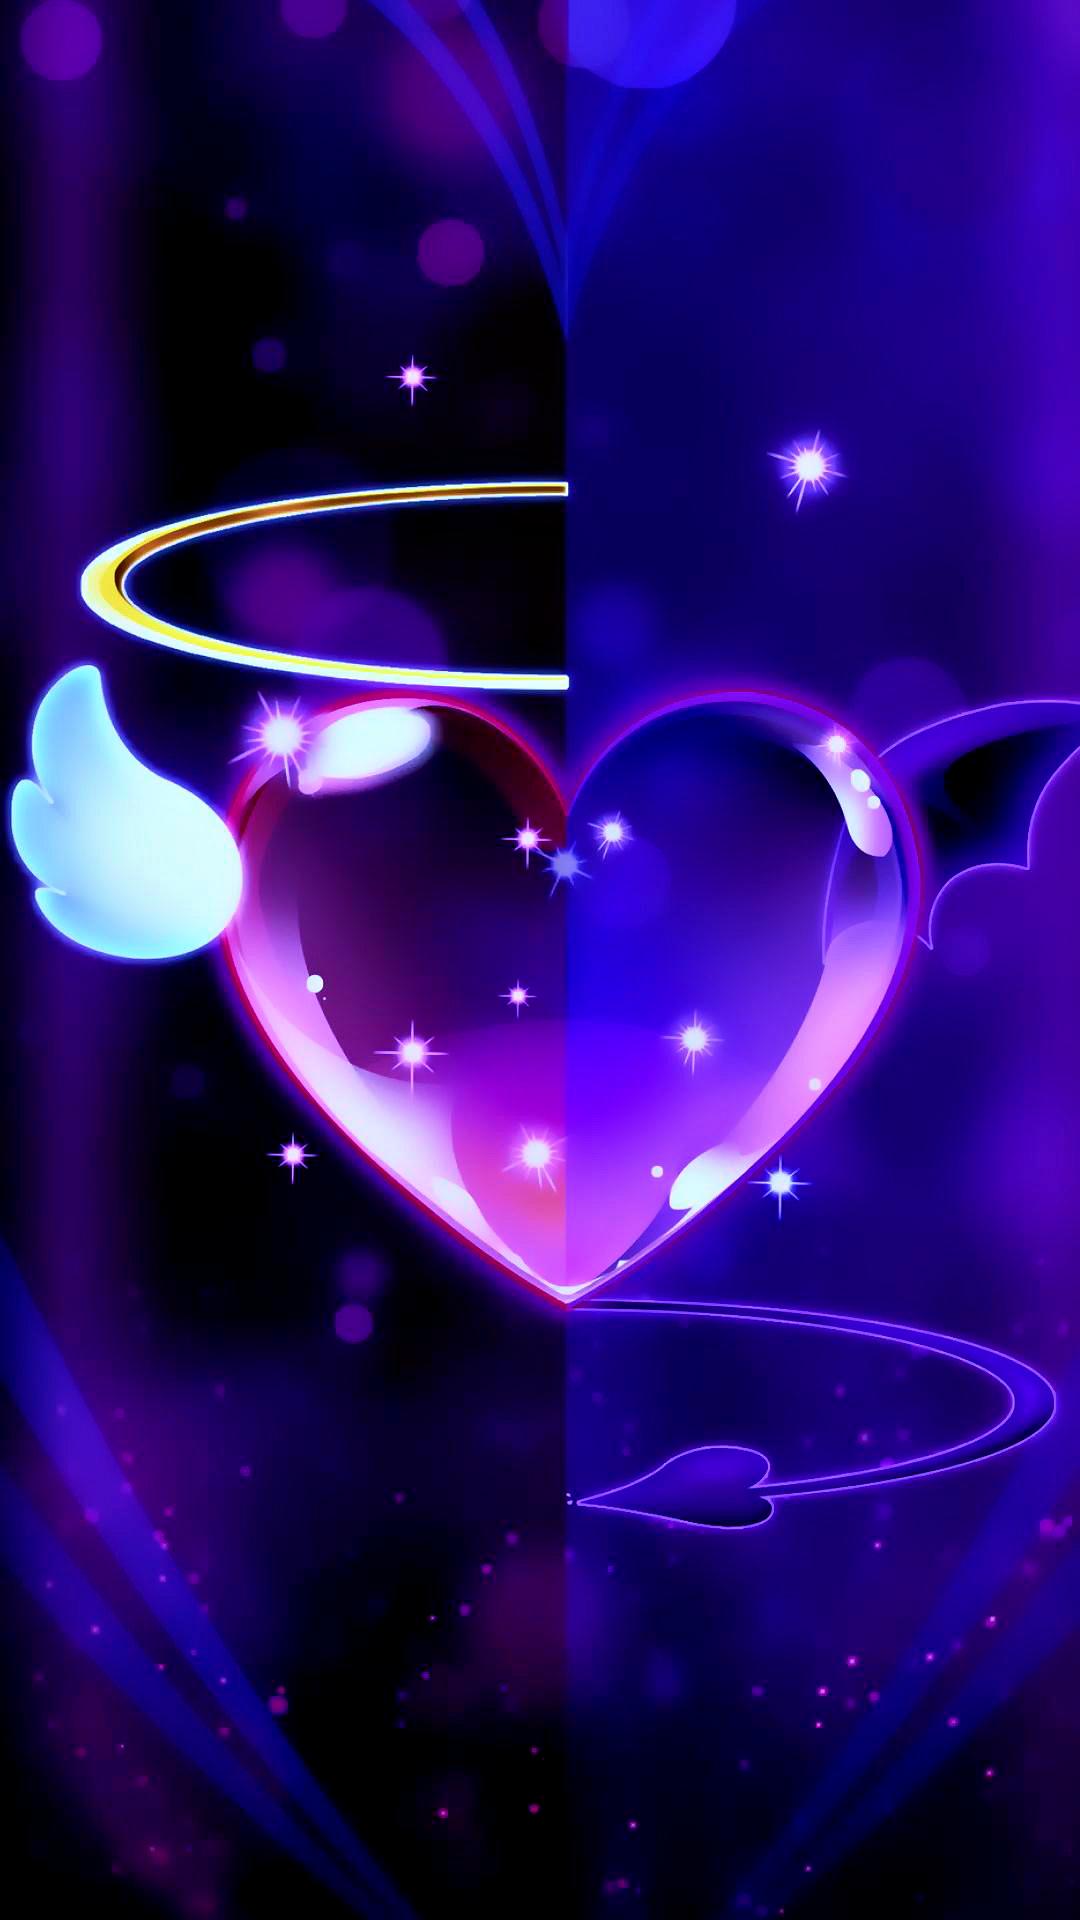 Pin By Georgianna John On Hearts Cute Galaxy Wallpaper Cute Emoji Wallpaper Galaxy Wallpaper